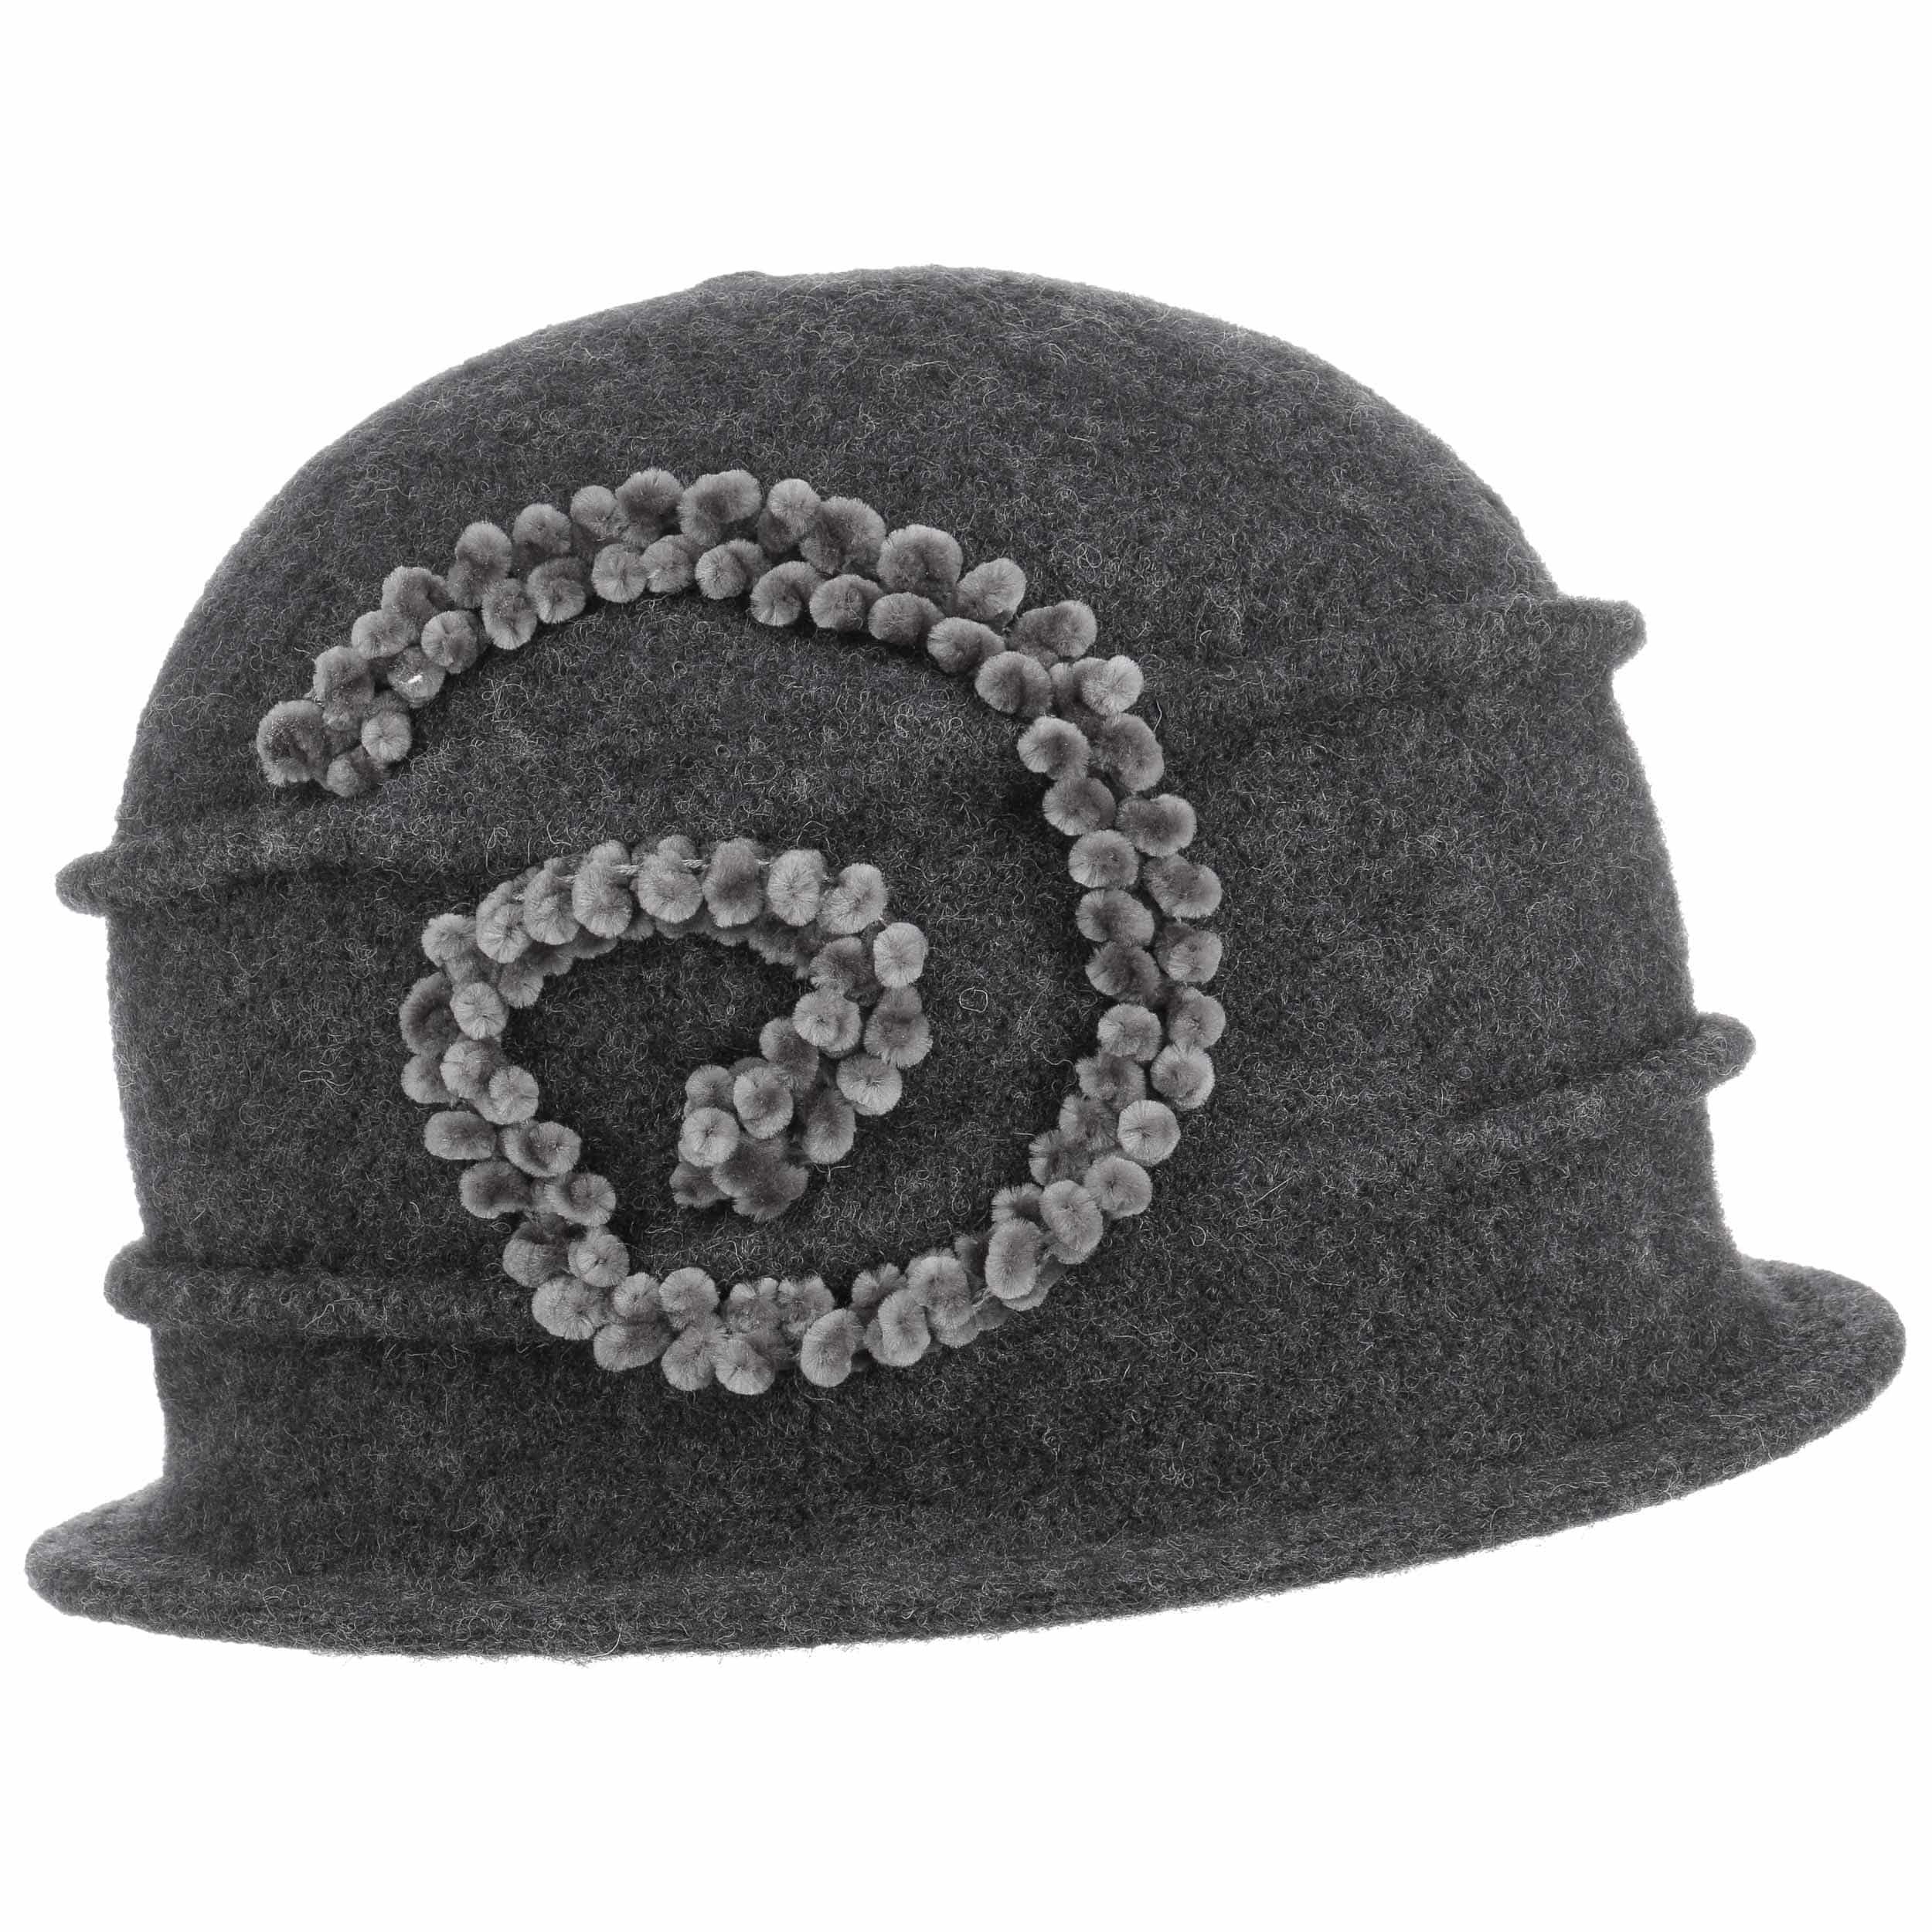 ... Sombrero de Lana Hervida Chenille by Seeberger - antracita 5 ... 6ed566ff60a